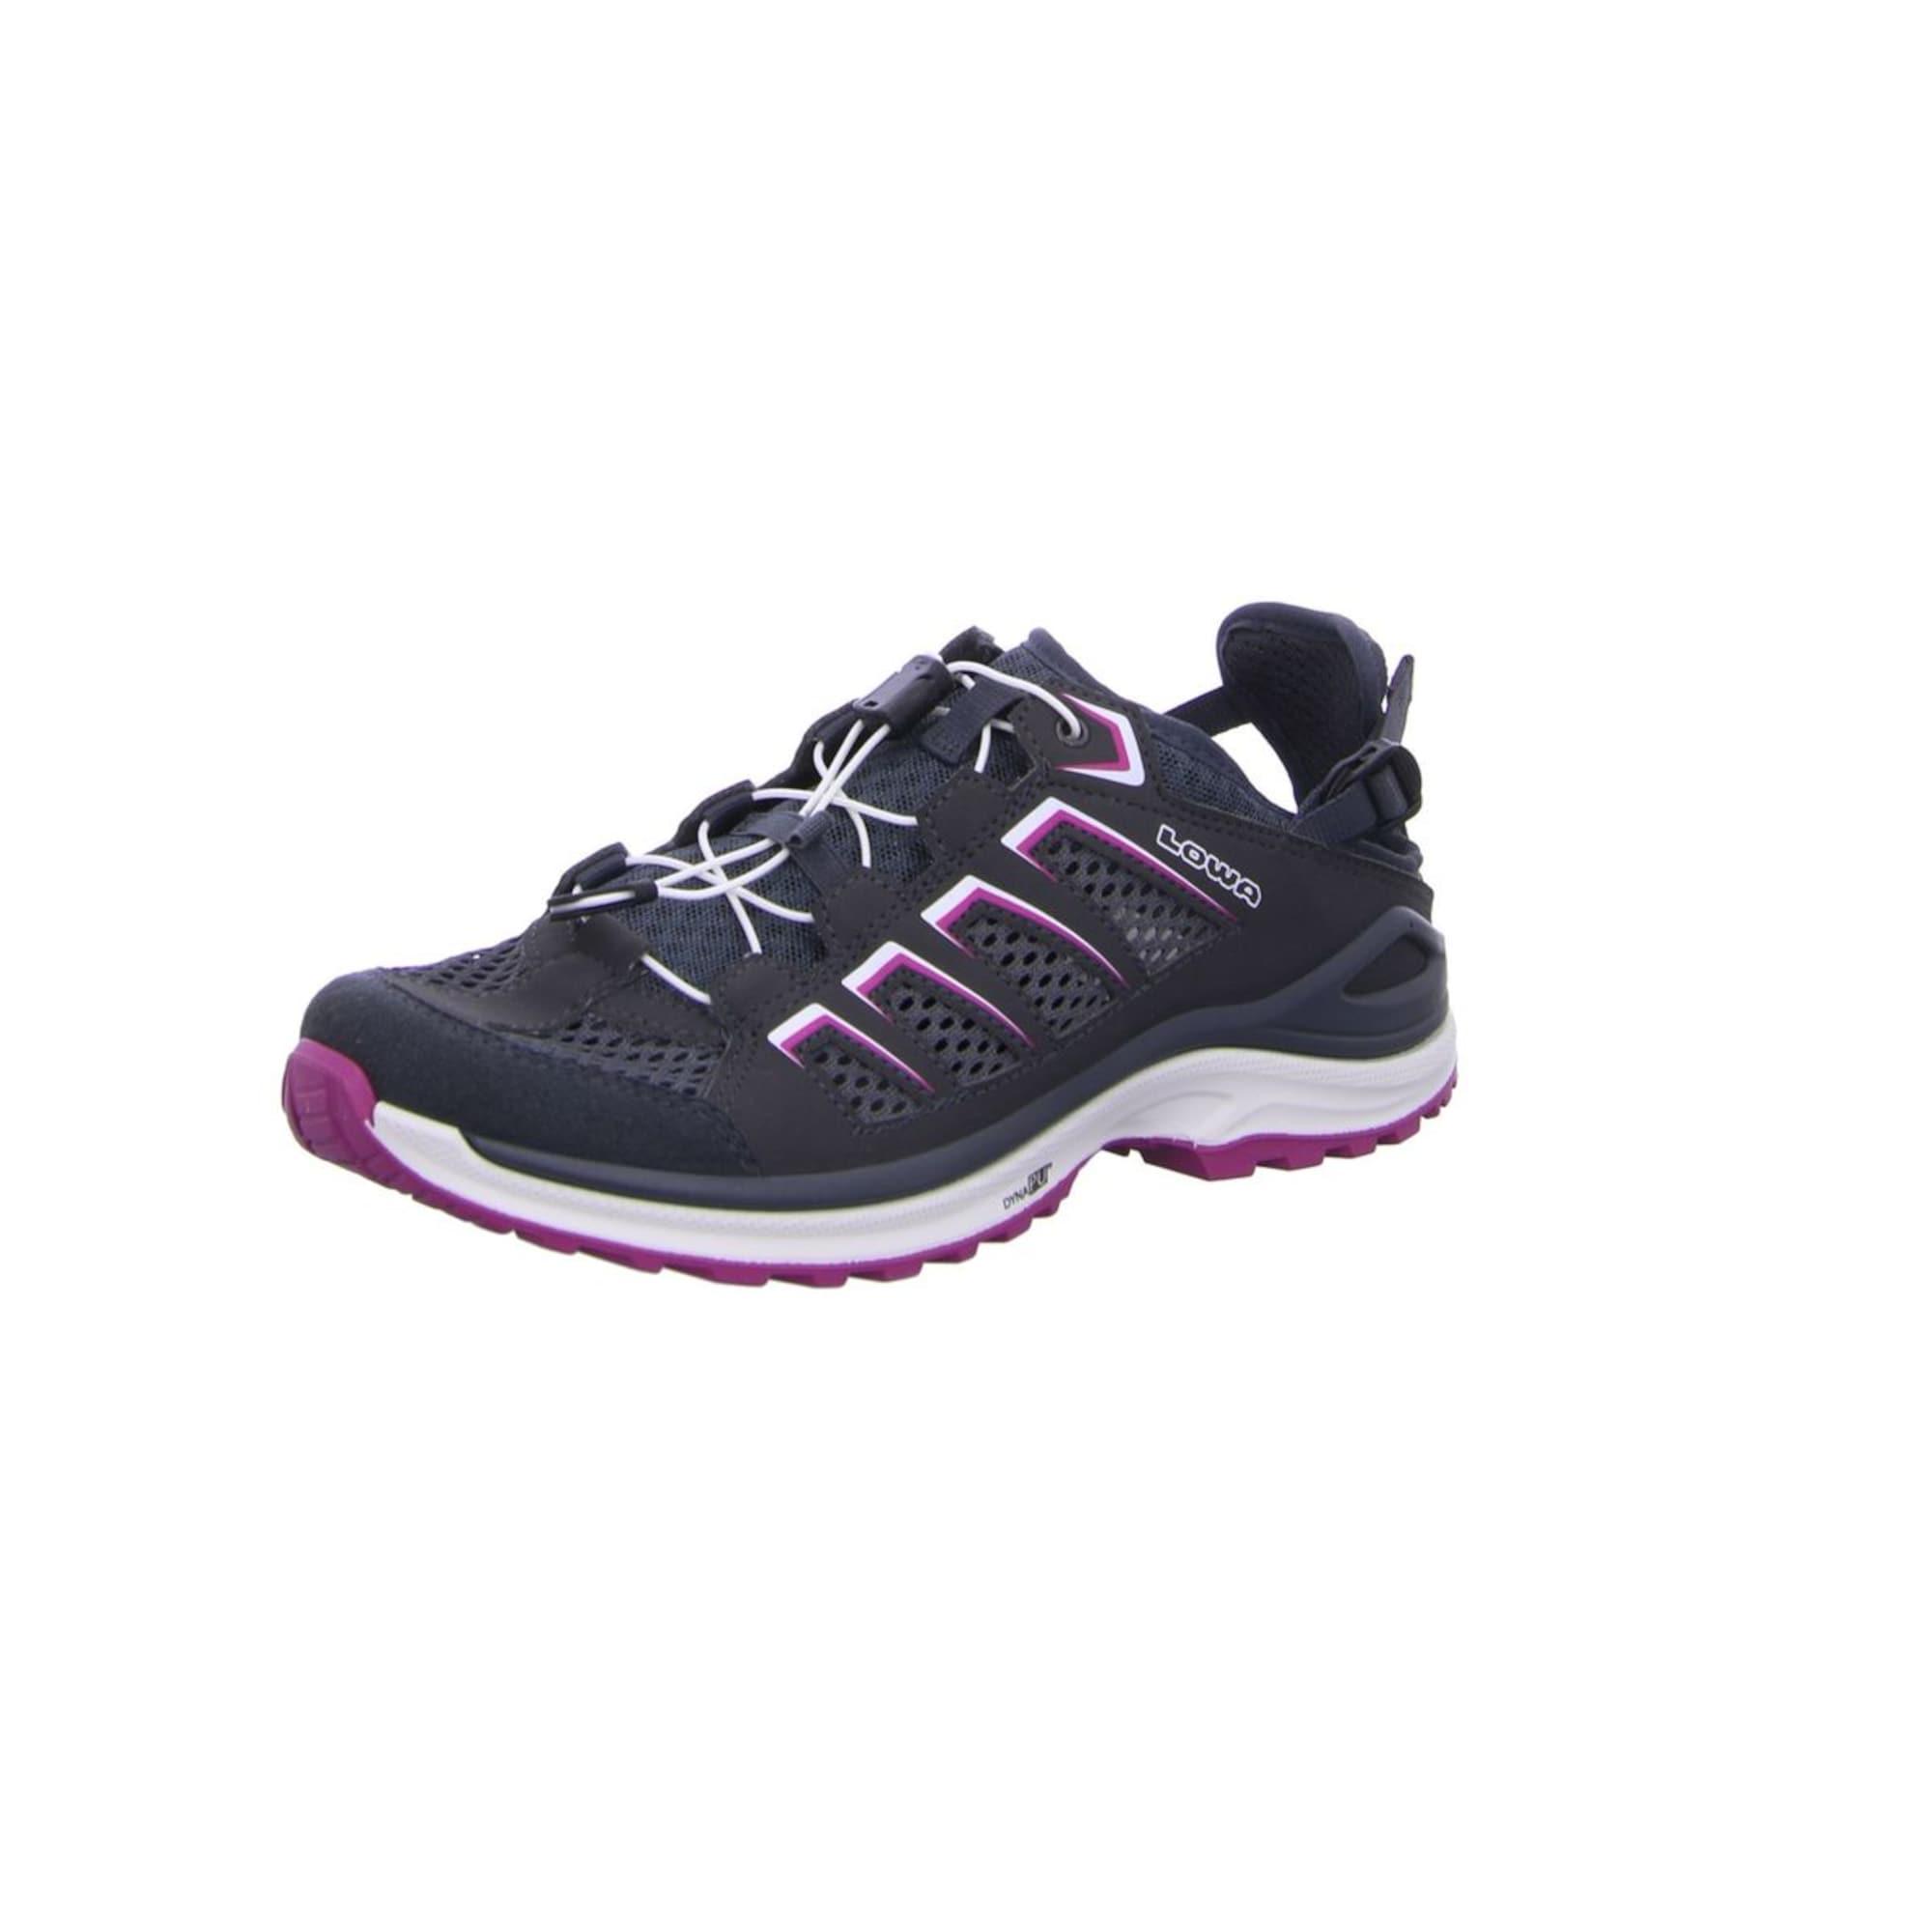 Outdoorschuhe   Schuhe > Outdoorschuhe > Wanderschuhe   Kobaltblau - Pink   LOWA